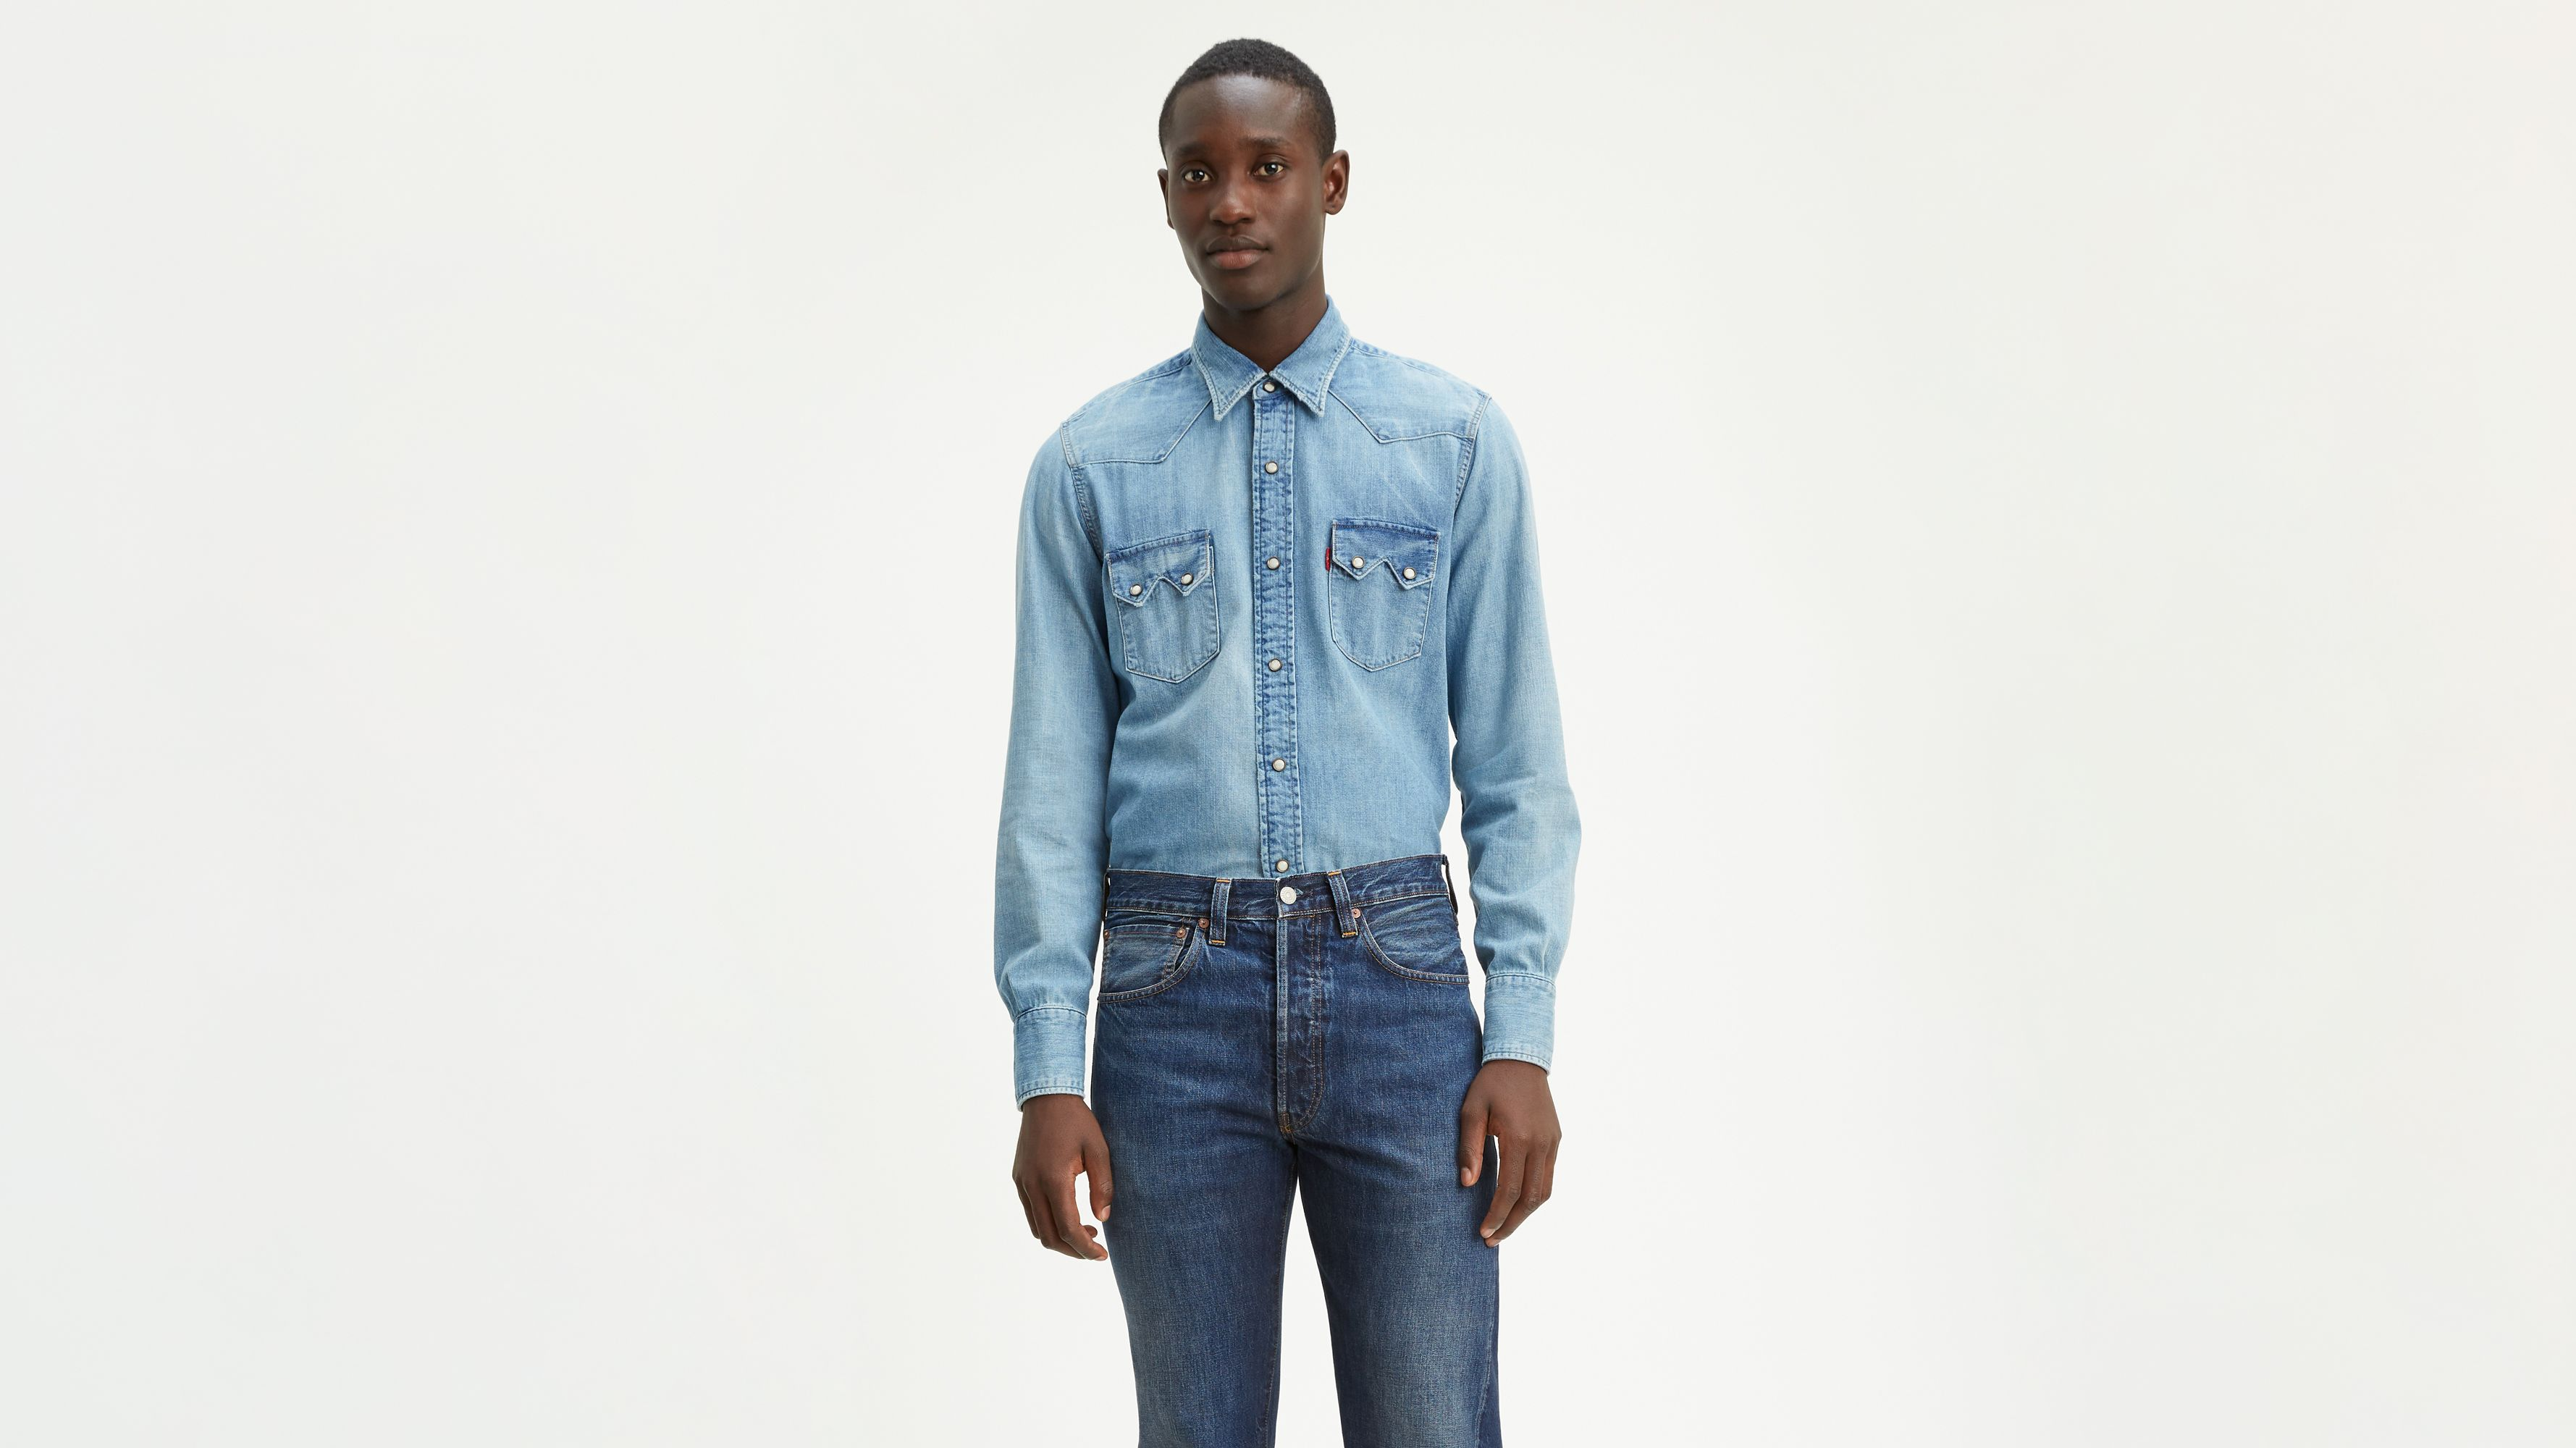 844727aa8265 Levi's® Vintage Clothing 1955 Sawtooth Denim Shirt - Medium Wash   Levi's®  GB